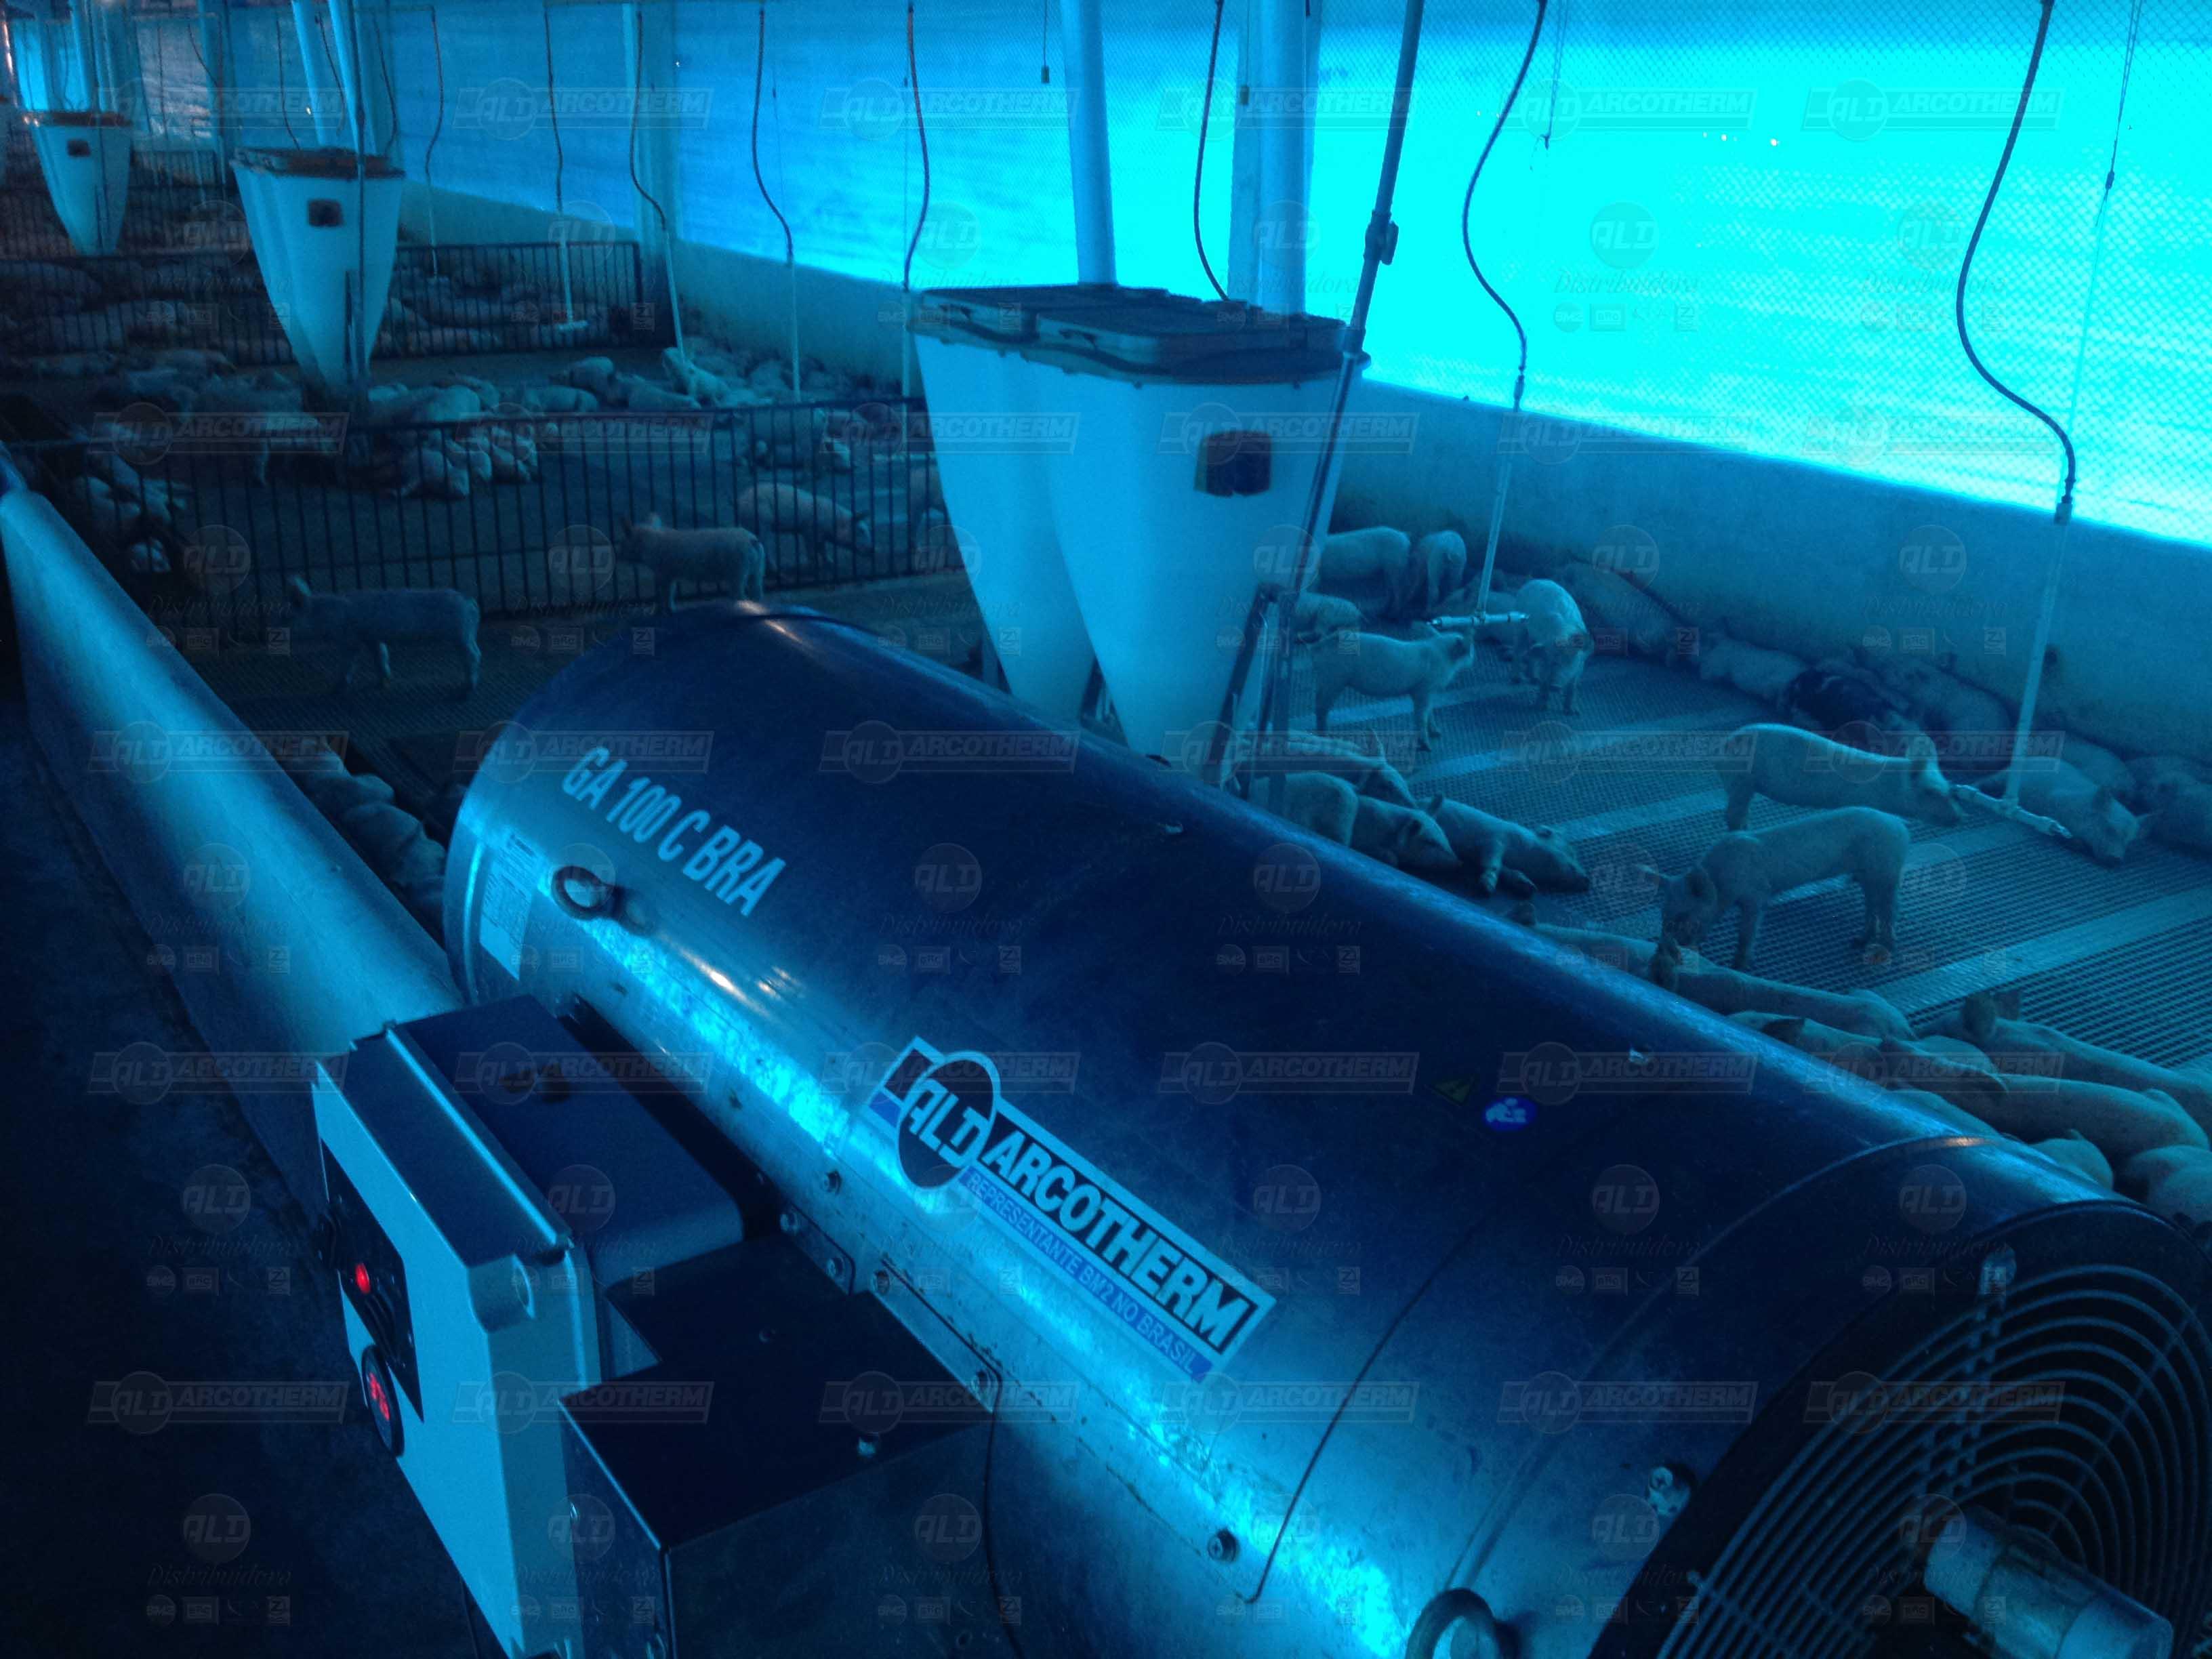 Suinos - galpao recria de leitoes - UPL - aquecedor - gerador de ar quente - arcotherm- 2